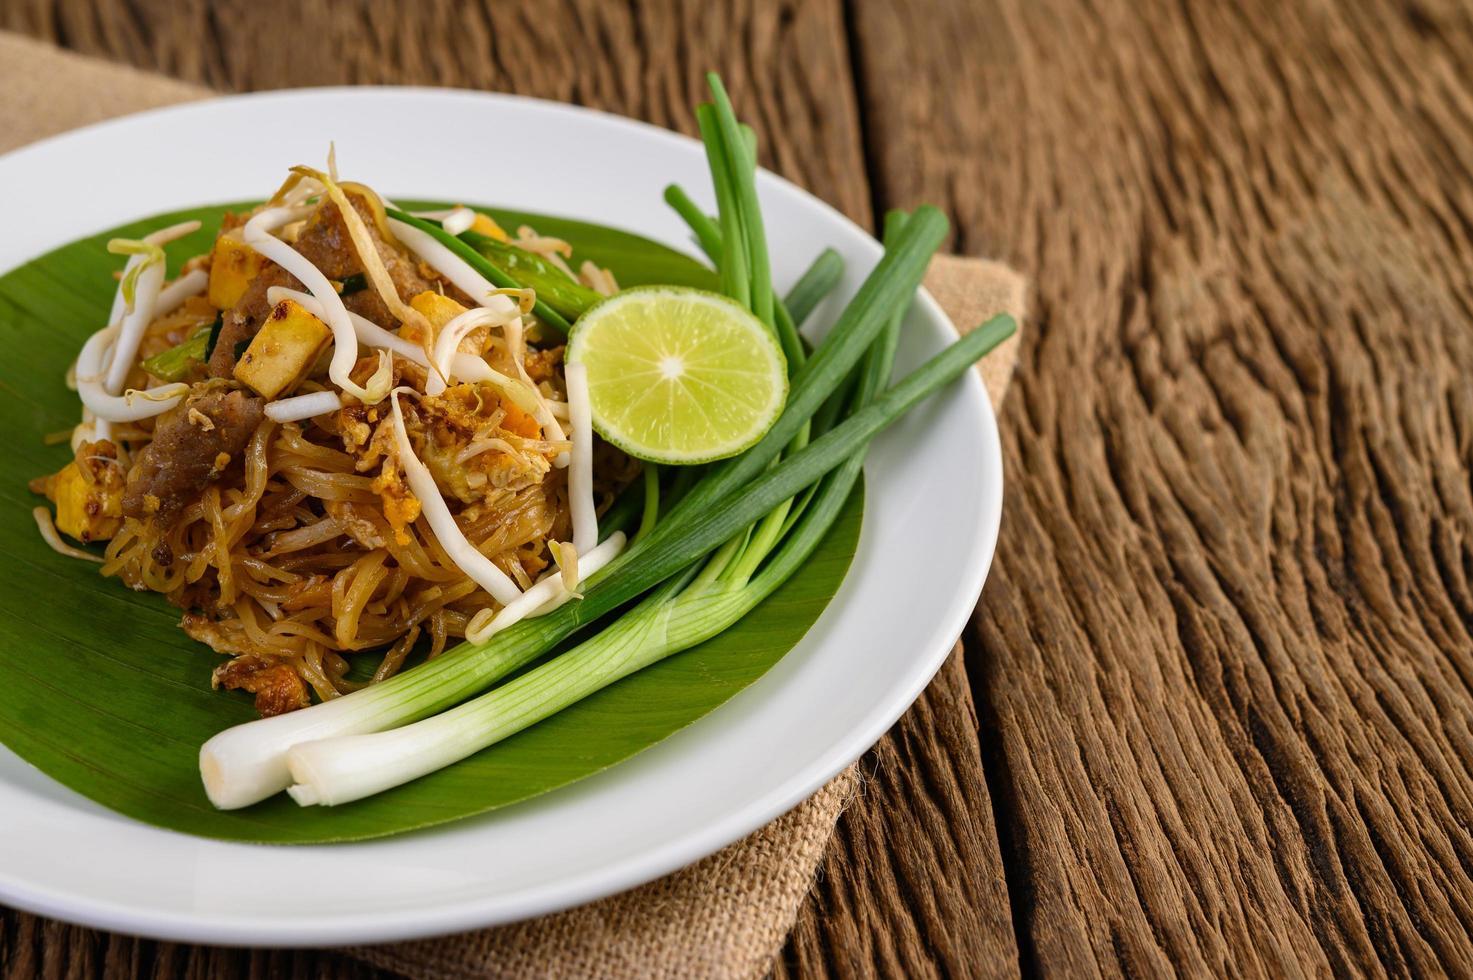 Pad Thai dish on a banana leaf photo